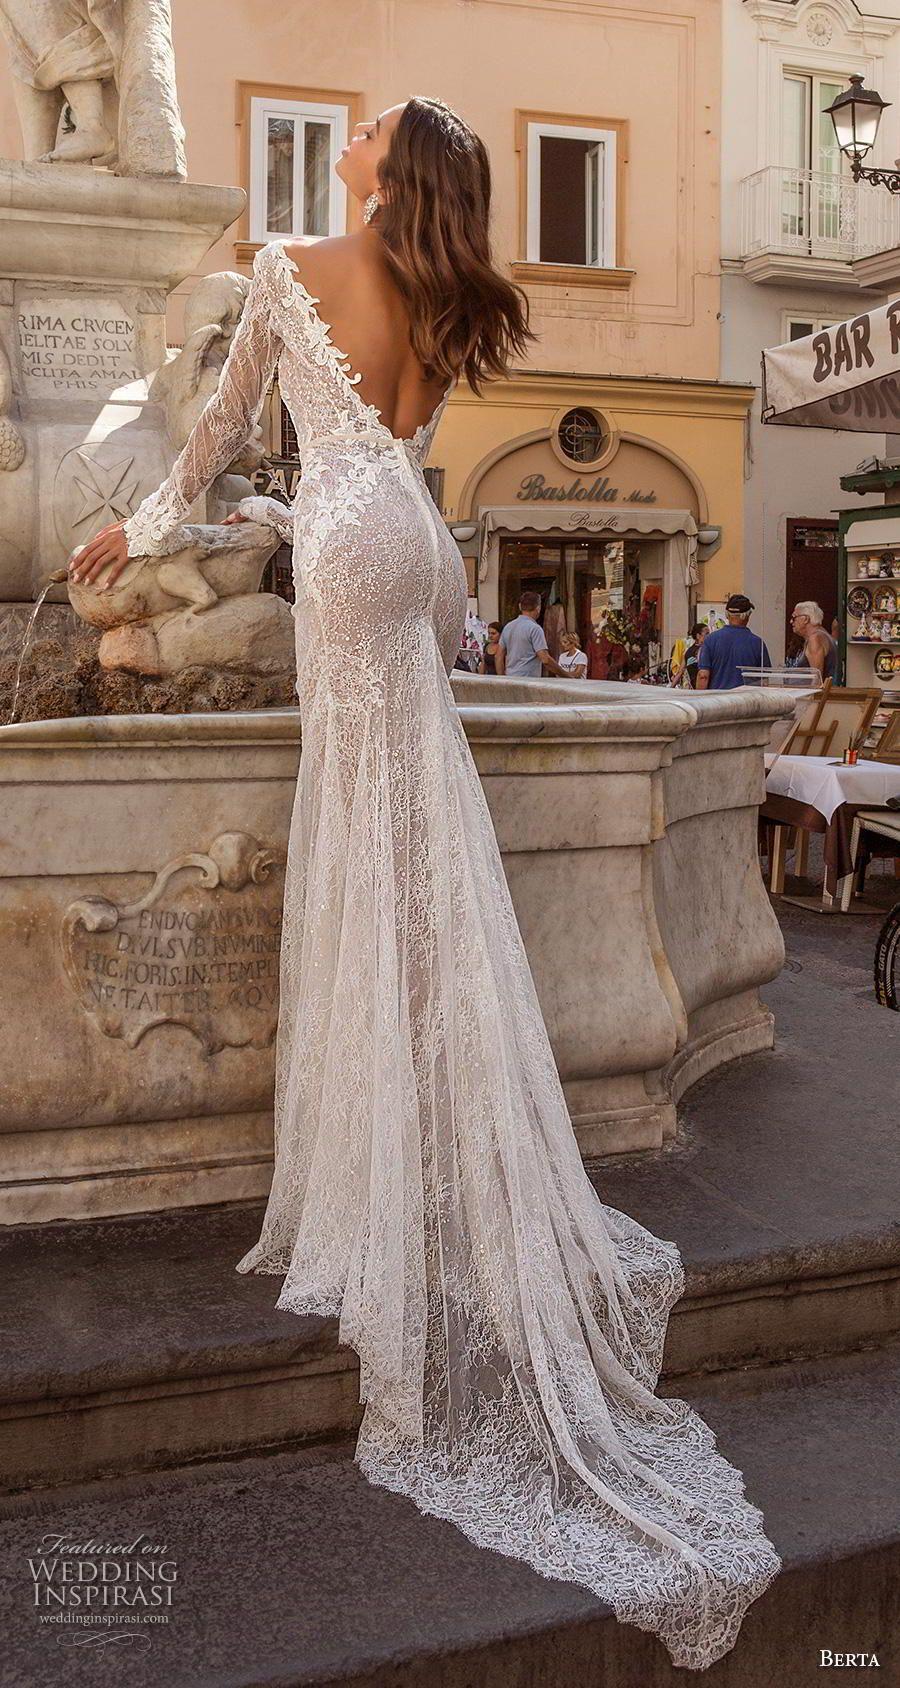 Berta Privee 2020 Wedding Dresses Amalfi Bridal Collection No 3 Wedding Inspirasi Long Sleeve Mermaid Wedding Dress Lace Bridal Gown Wedding Dress Long Sleeve [ 1688 x 900 Pixel ]